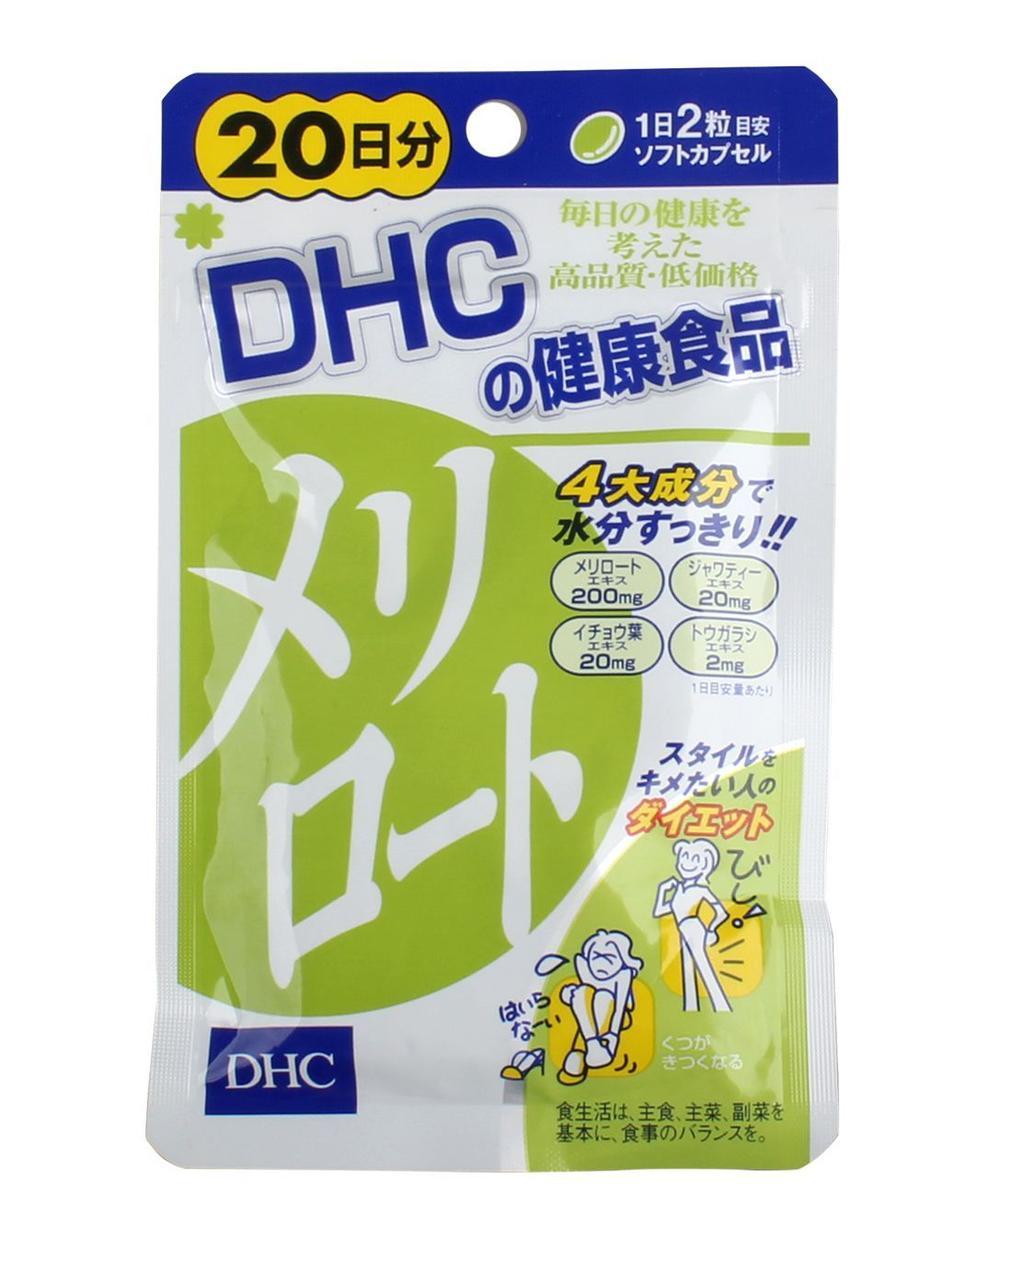 DHC Melilot Донник (экстракт) против целлюлита и отечности ног, 40 капсул на 20 дней